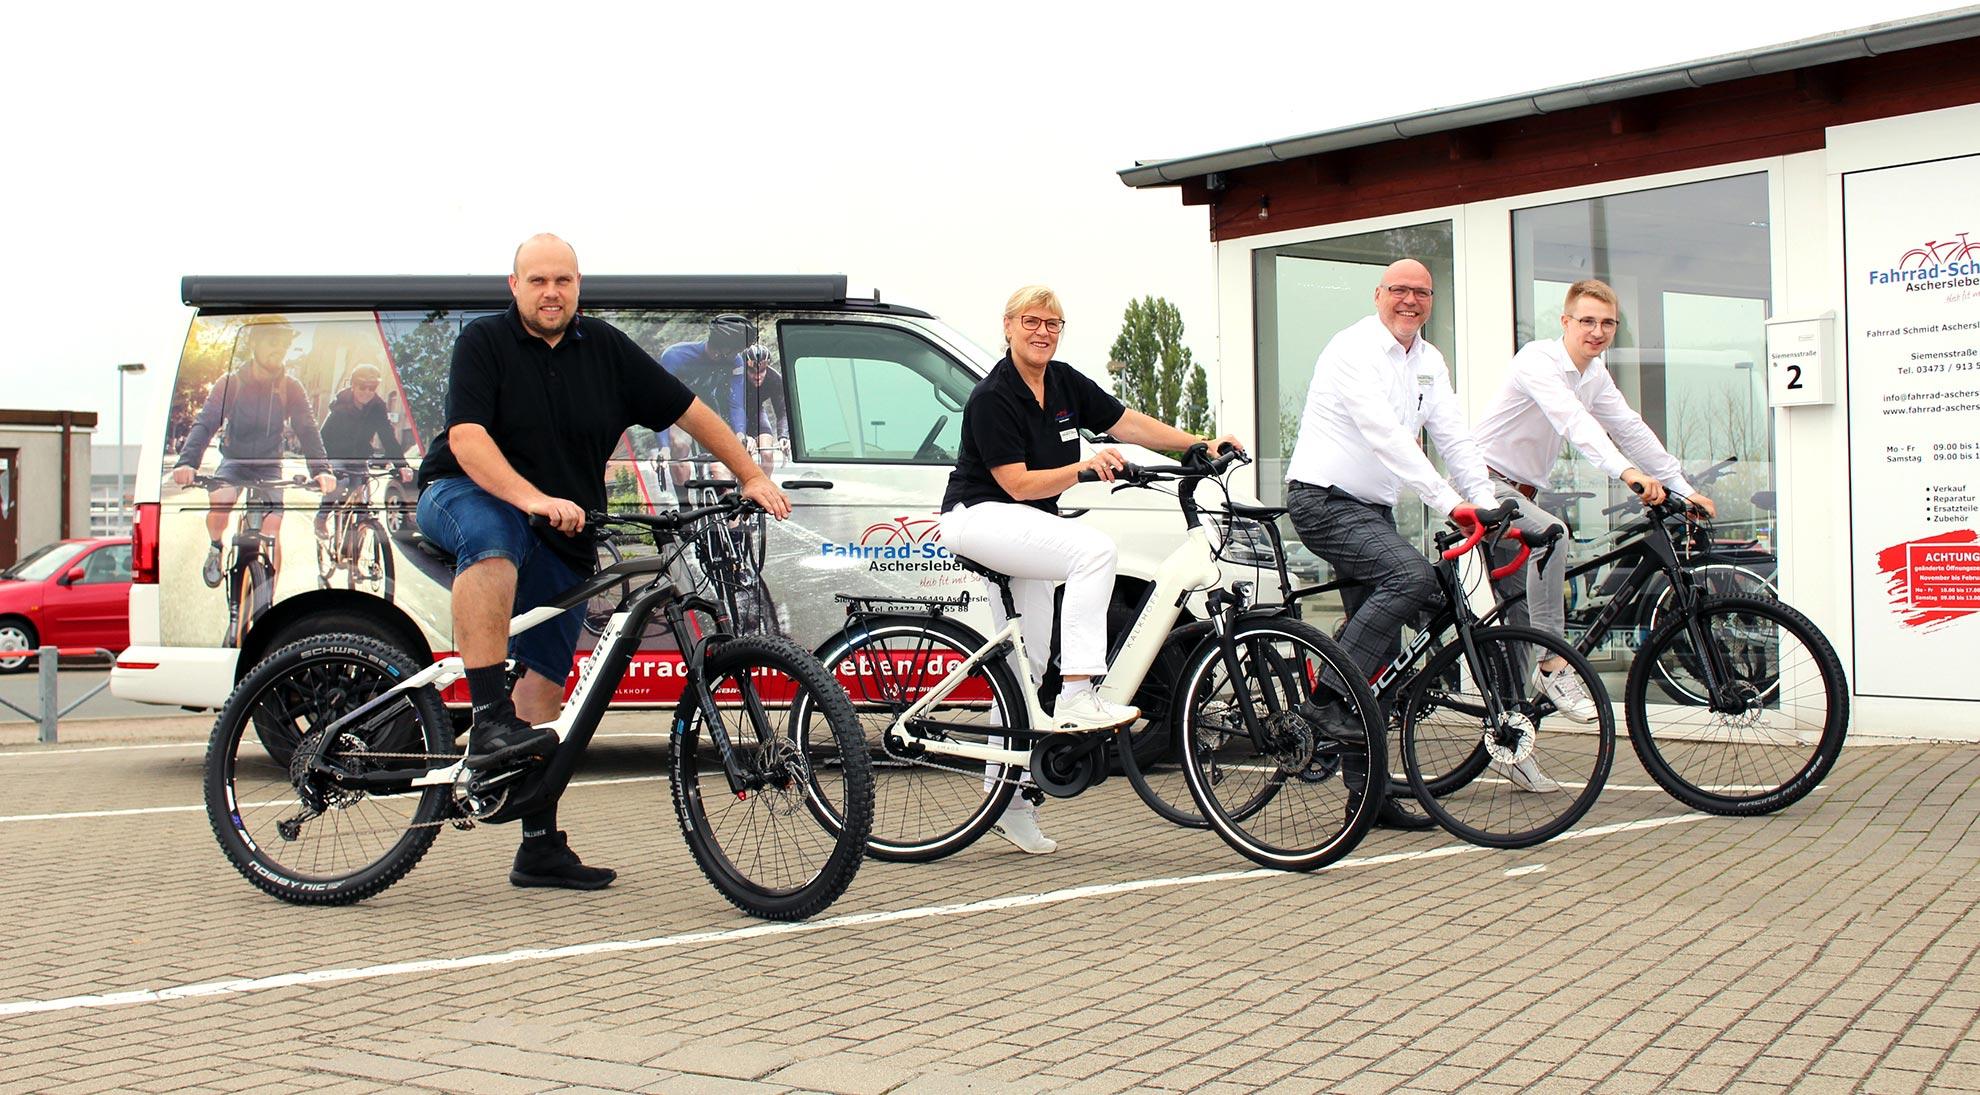 Team Fahrrad Schmidt